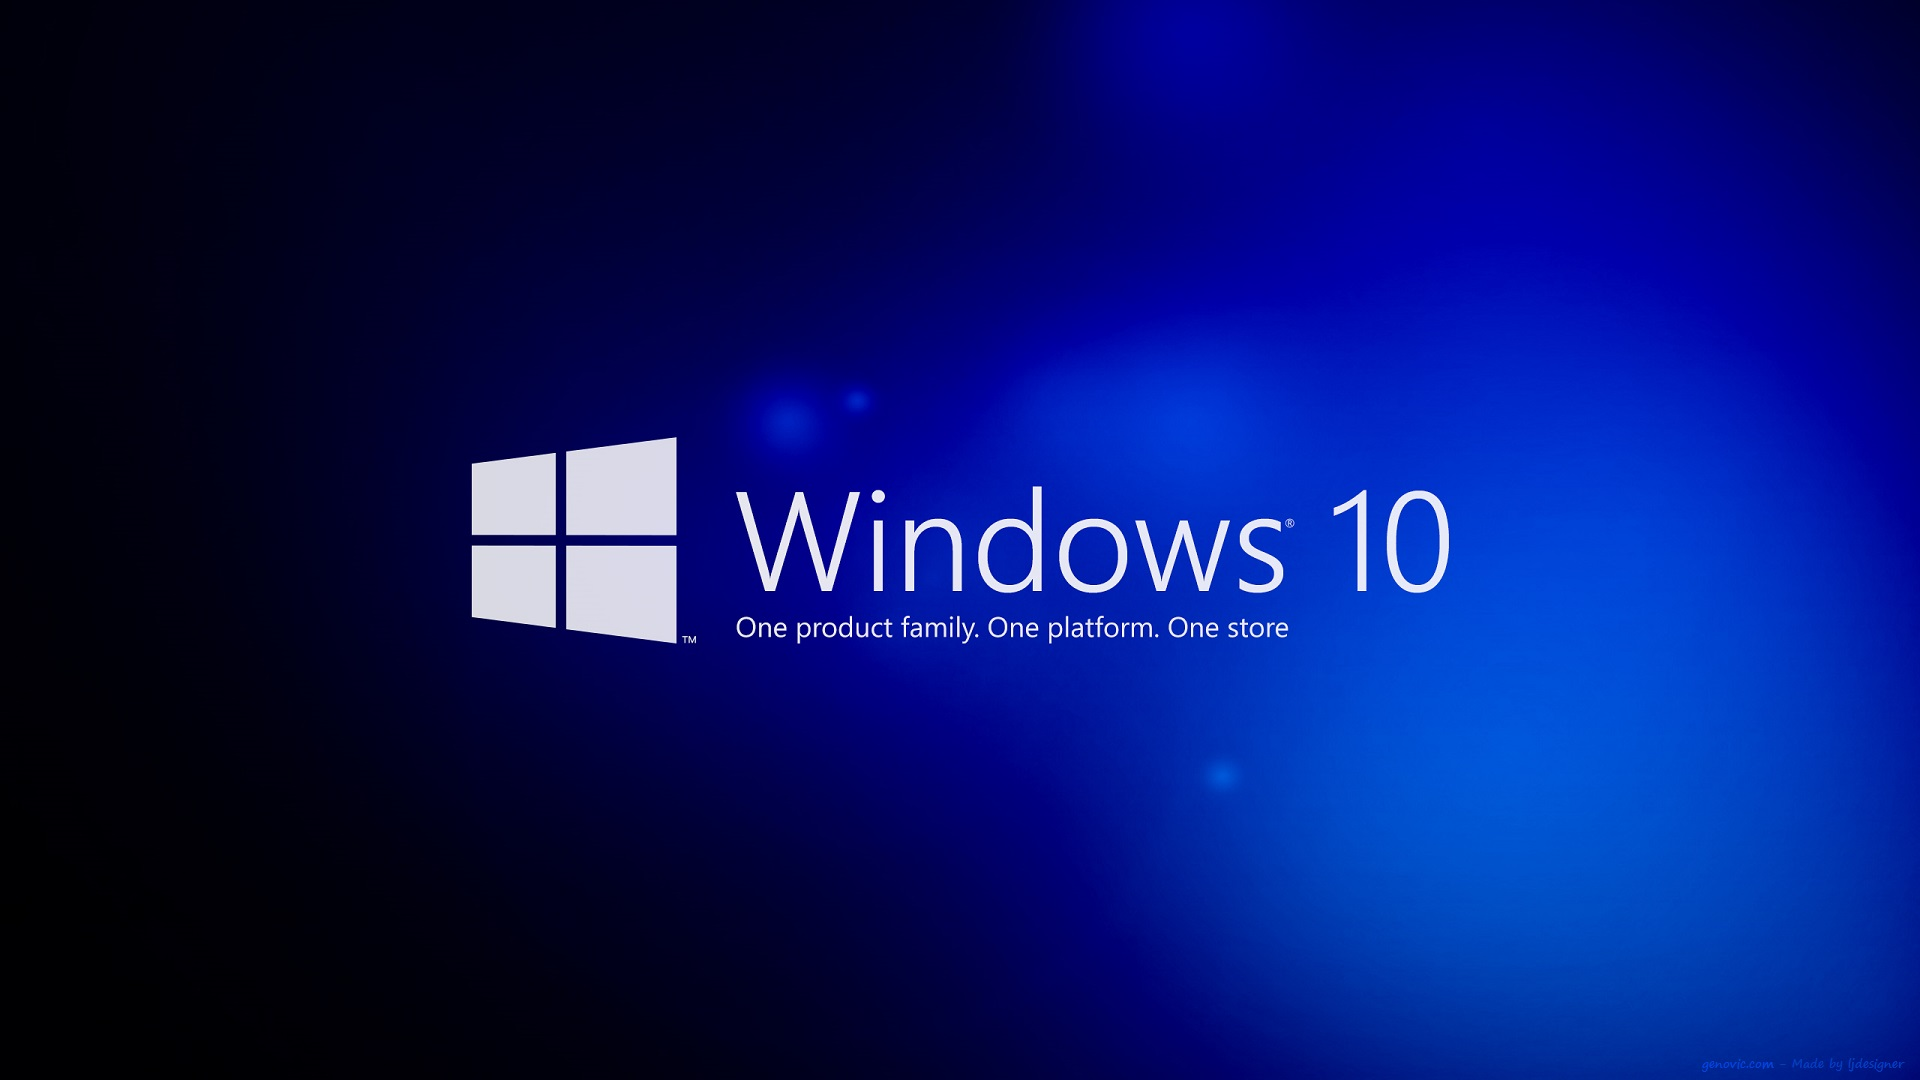 Microsoft windows 10 wallpaper themes wallpapersafari - Windows wallpaper themes free ...